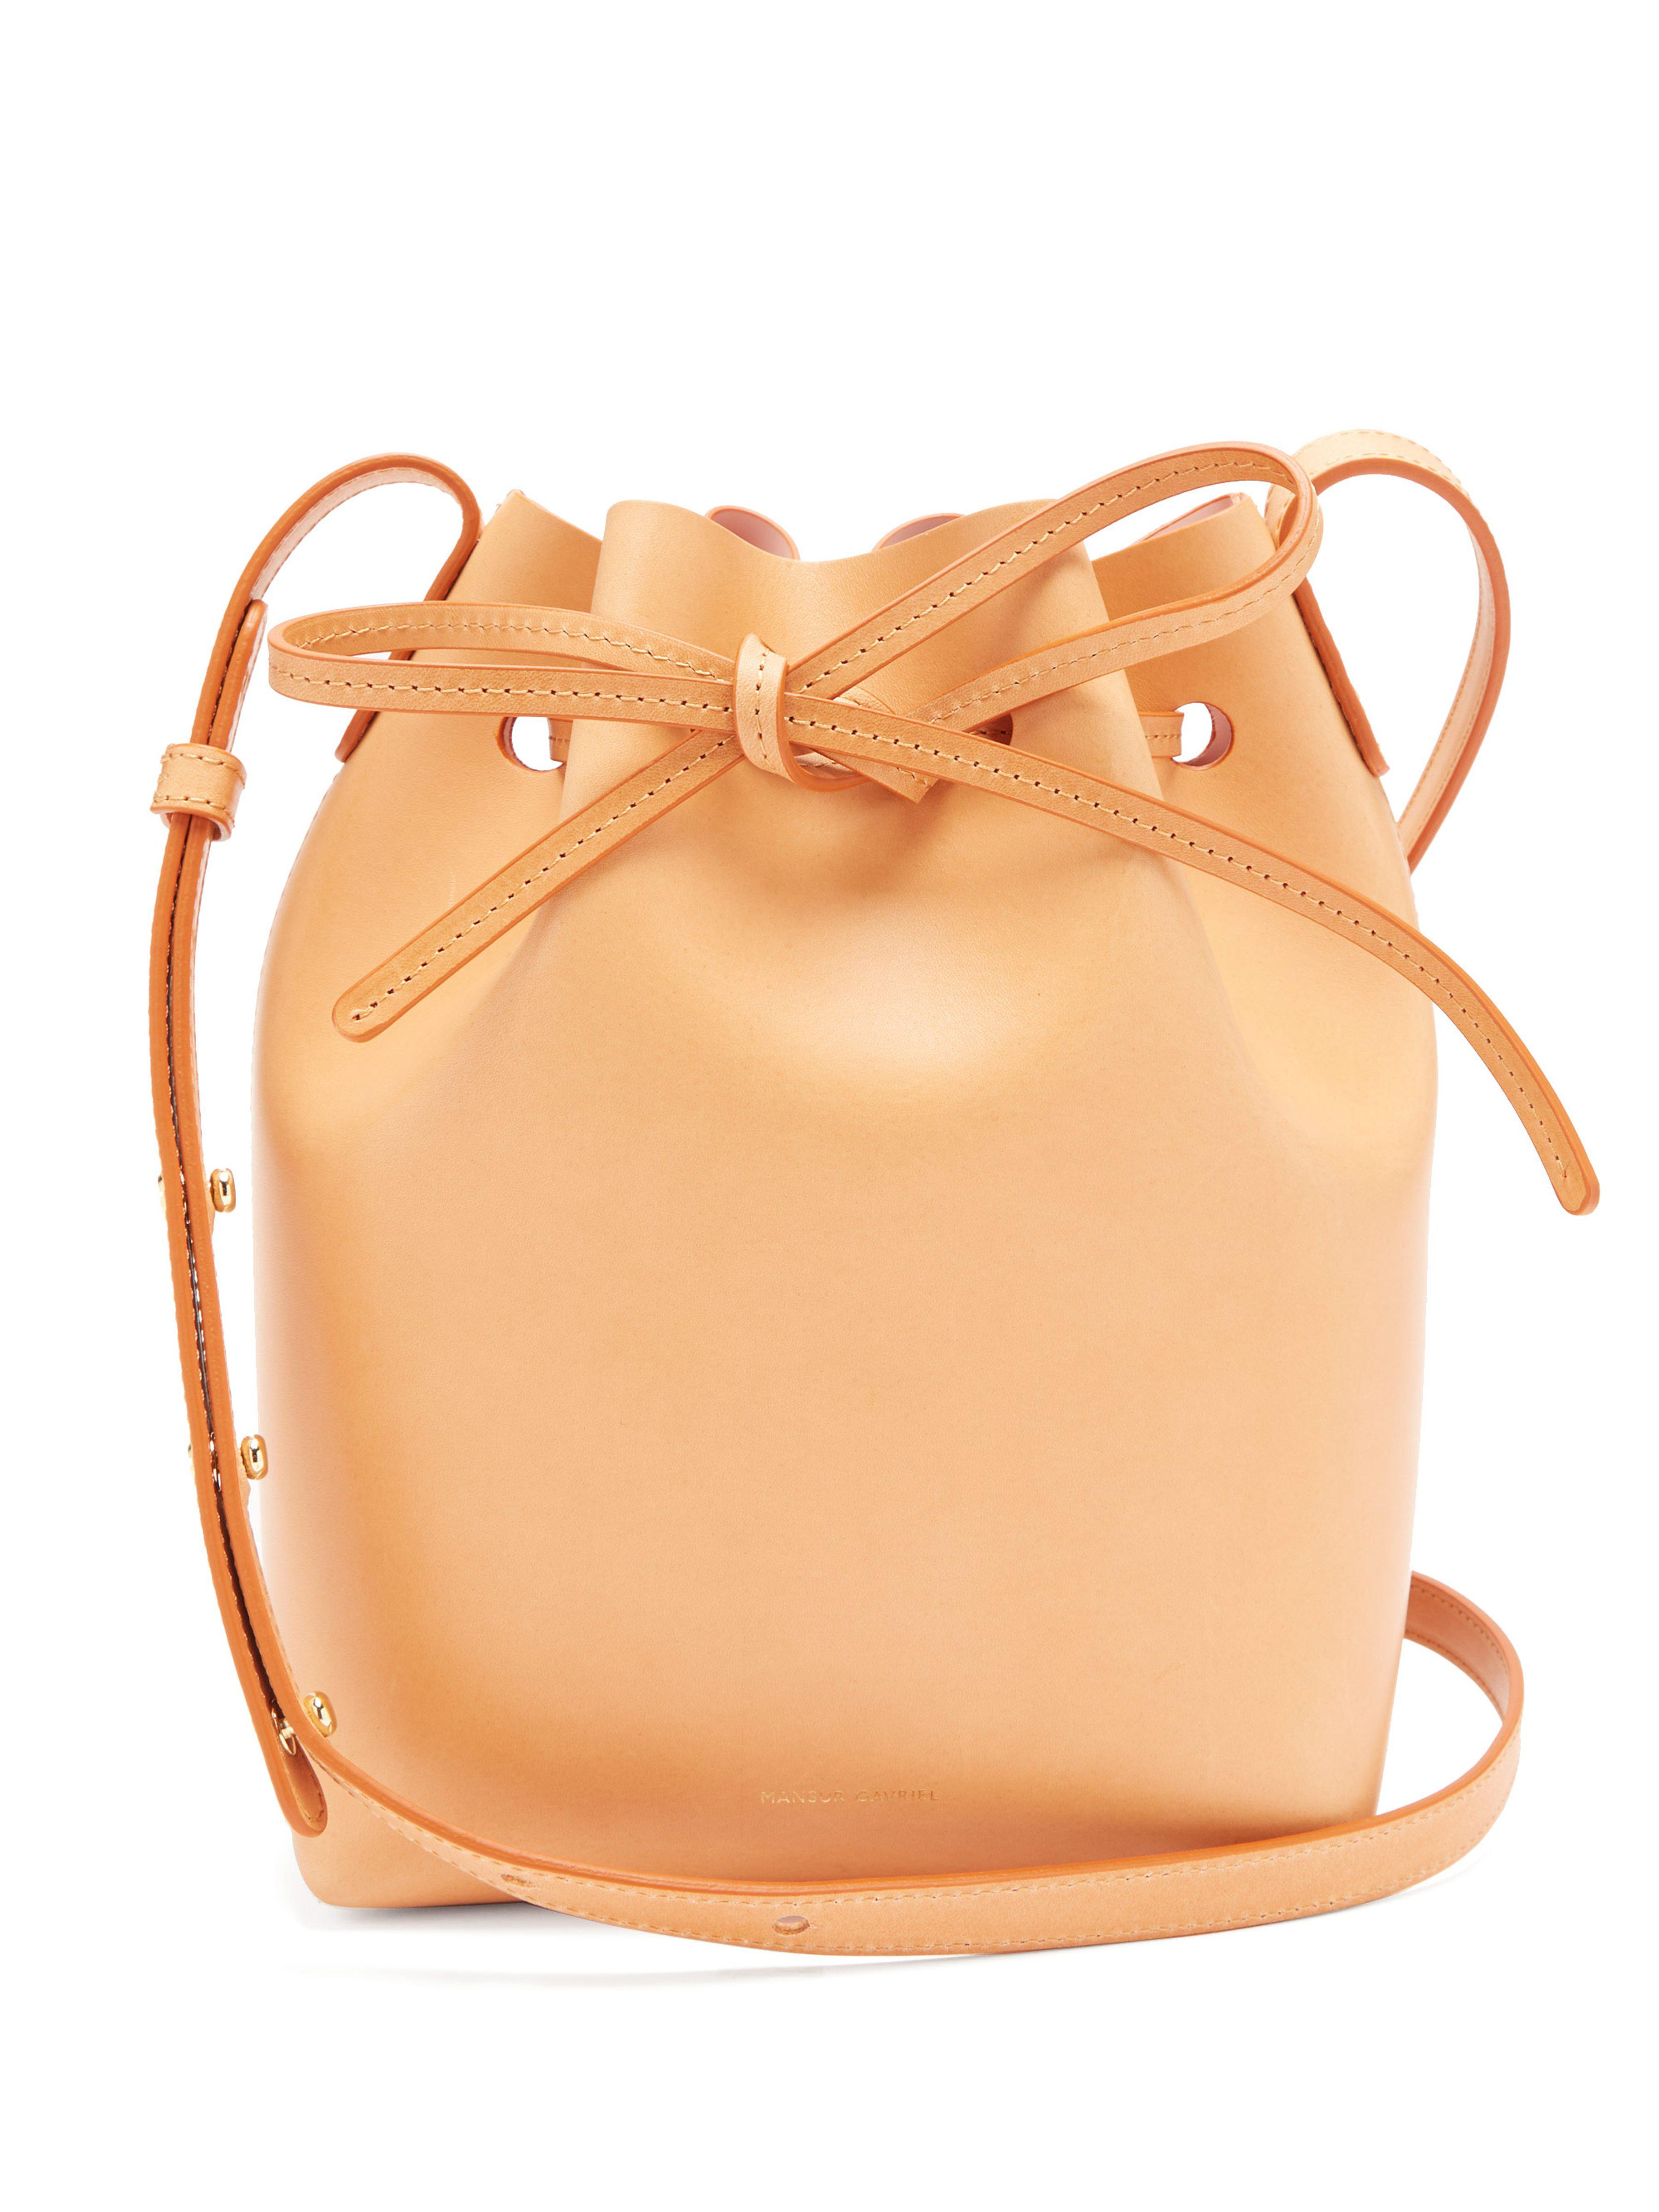 7520d2d04681 Mansur Gavriel Pink Lined Mini Leather Bucket Bag in Pink - Lyst